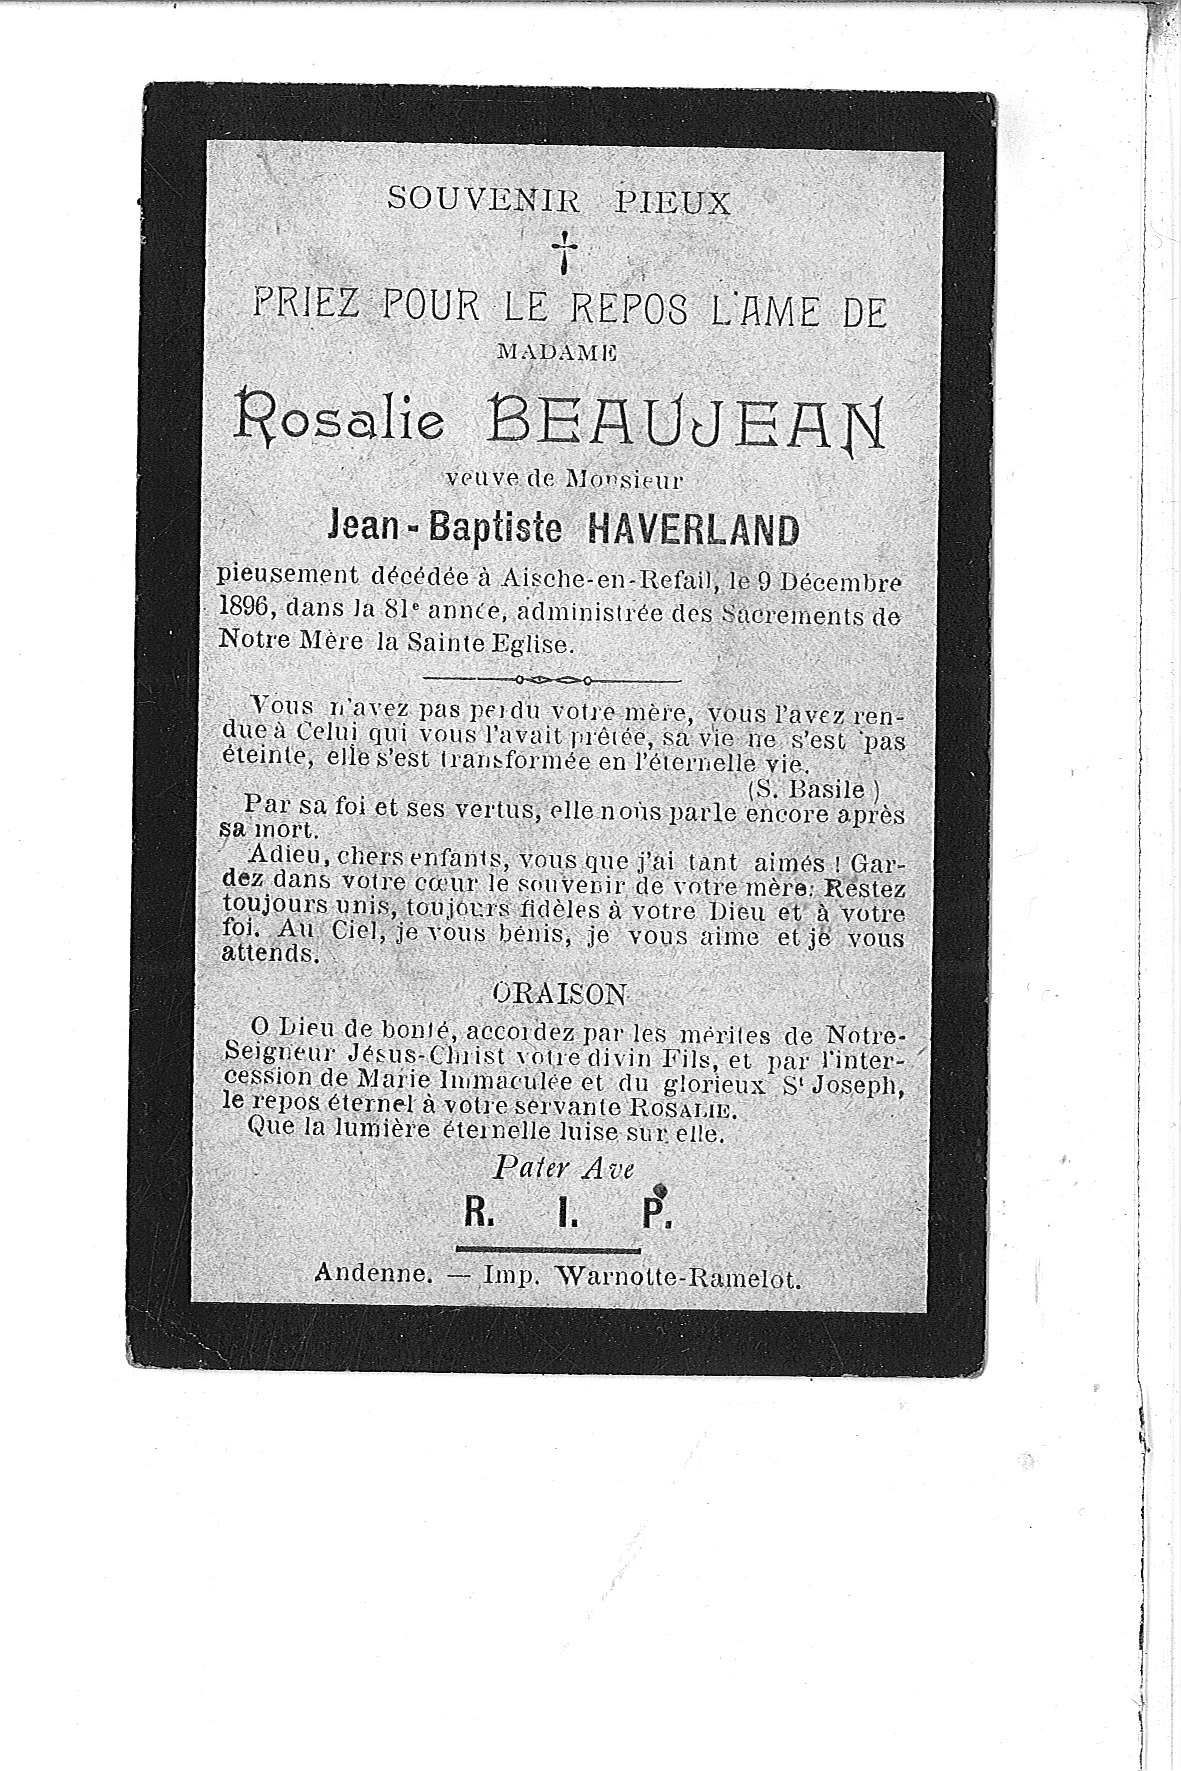 Rosalie(1896)20101117134816_00011.jpg